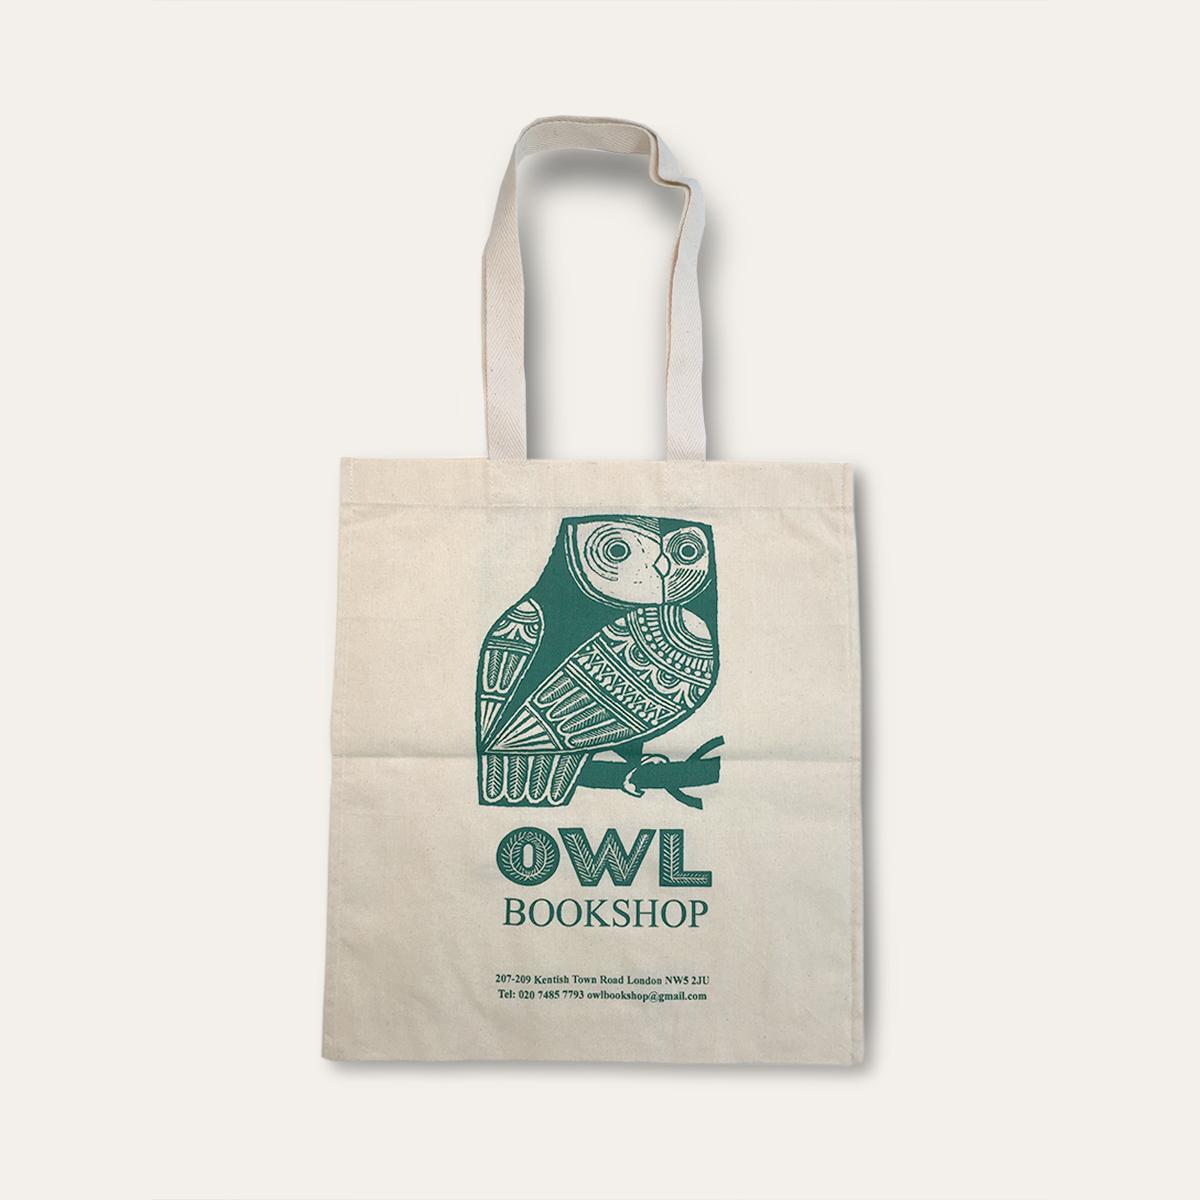 Owl Bookshop Bags